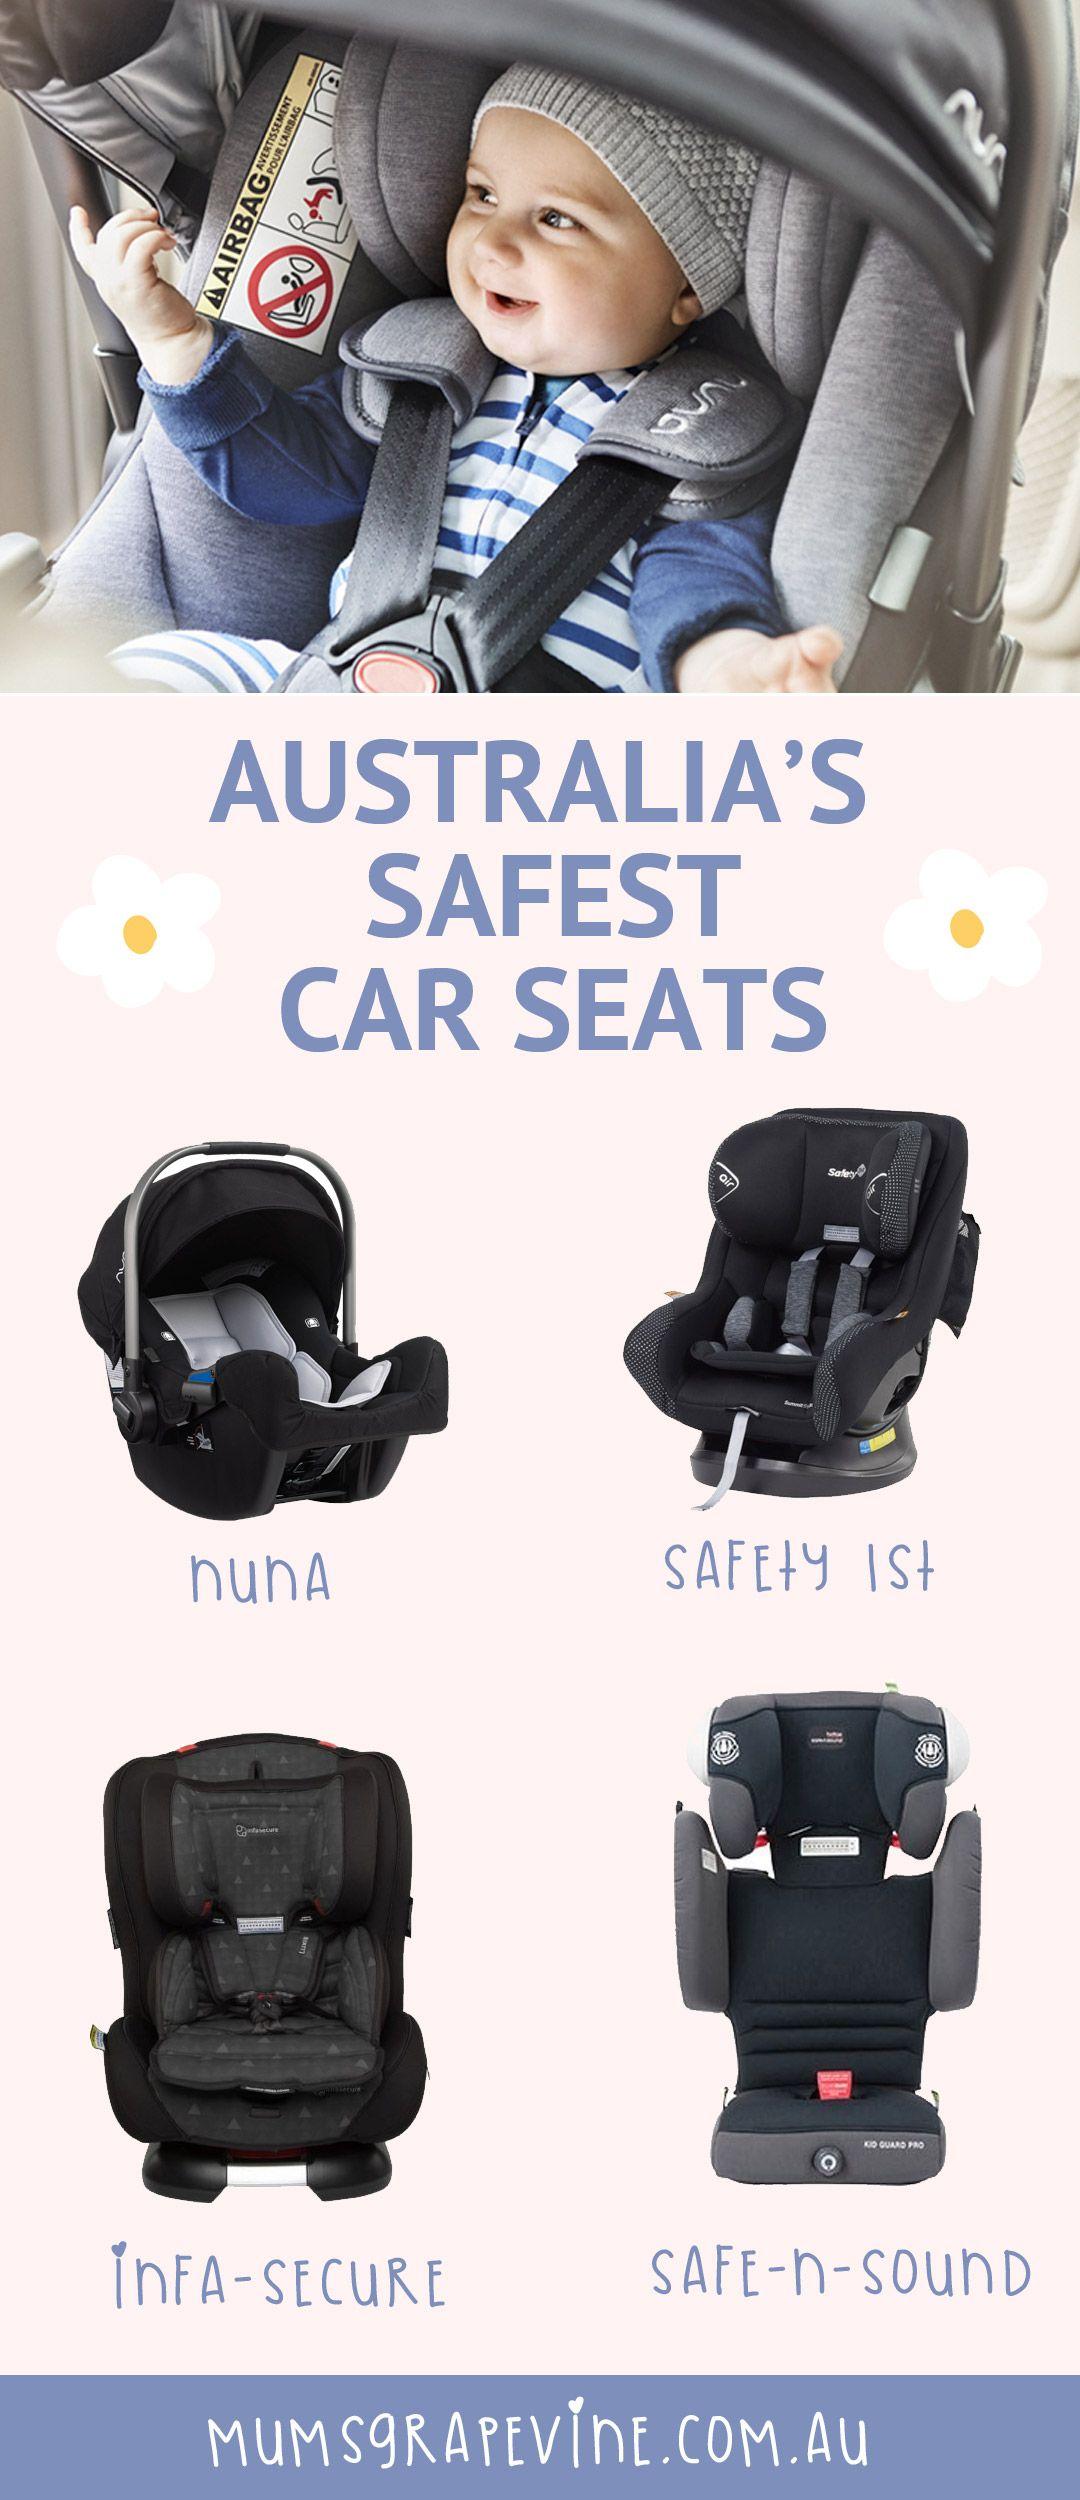 Tests Reveal Australia S Safest Car Seats Safe Car Seats Car